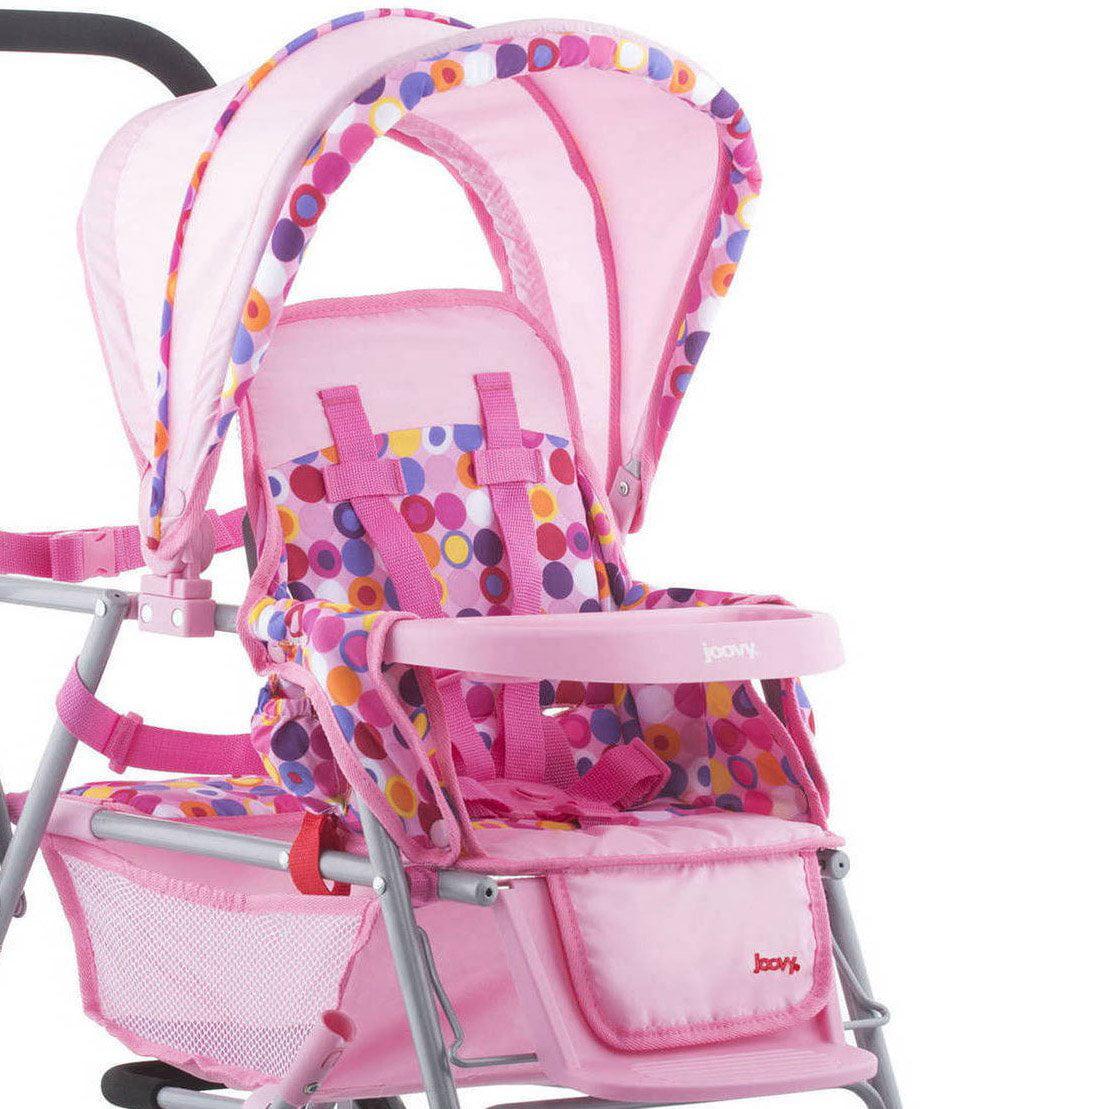 Joovy Pretend Play Stroller Toy Doll Car Seat Portable Room2 Playard Pink